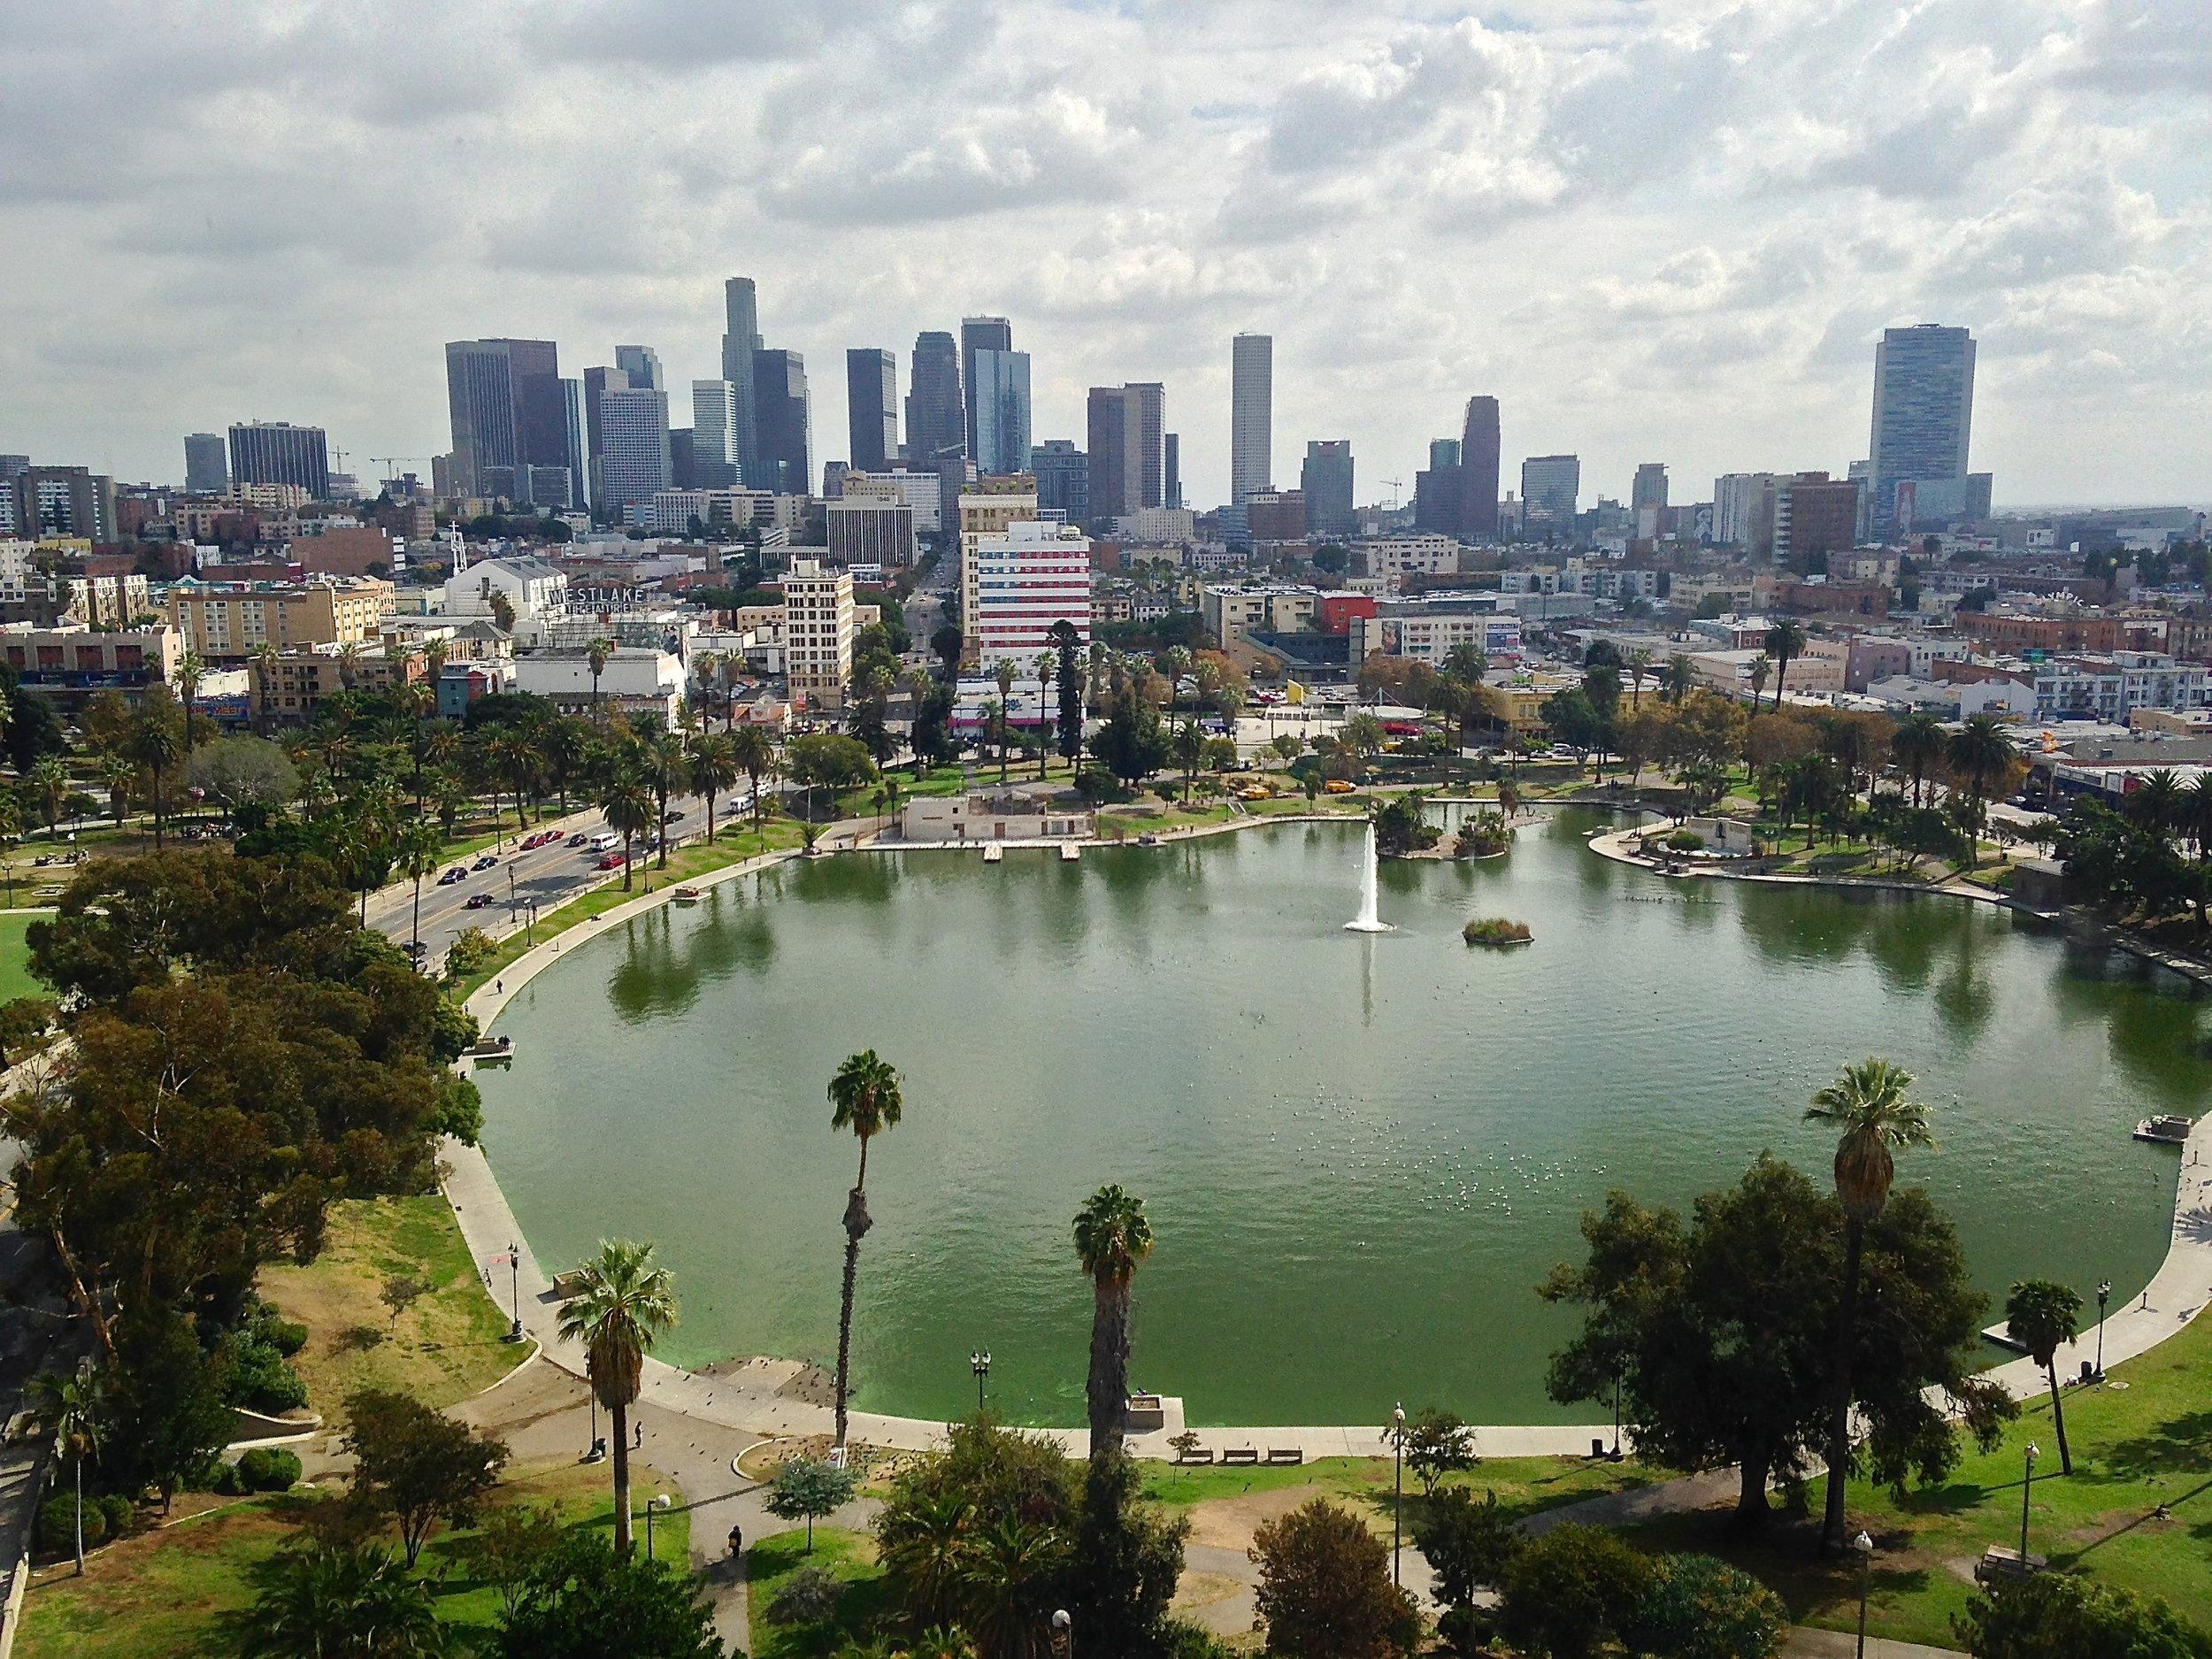 MacArthur_Park,_Los_Angeles.jpg